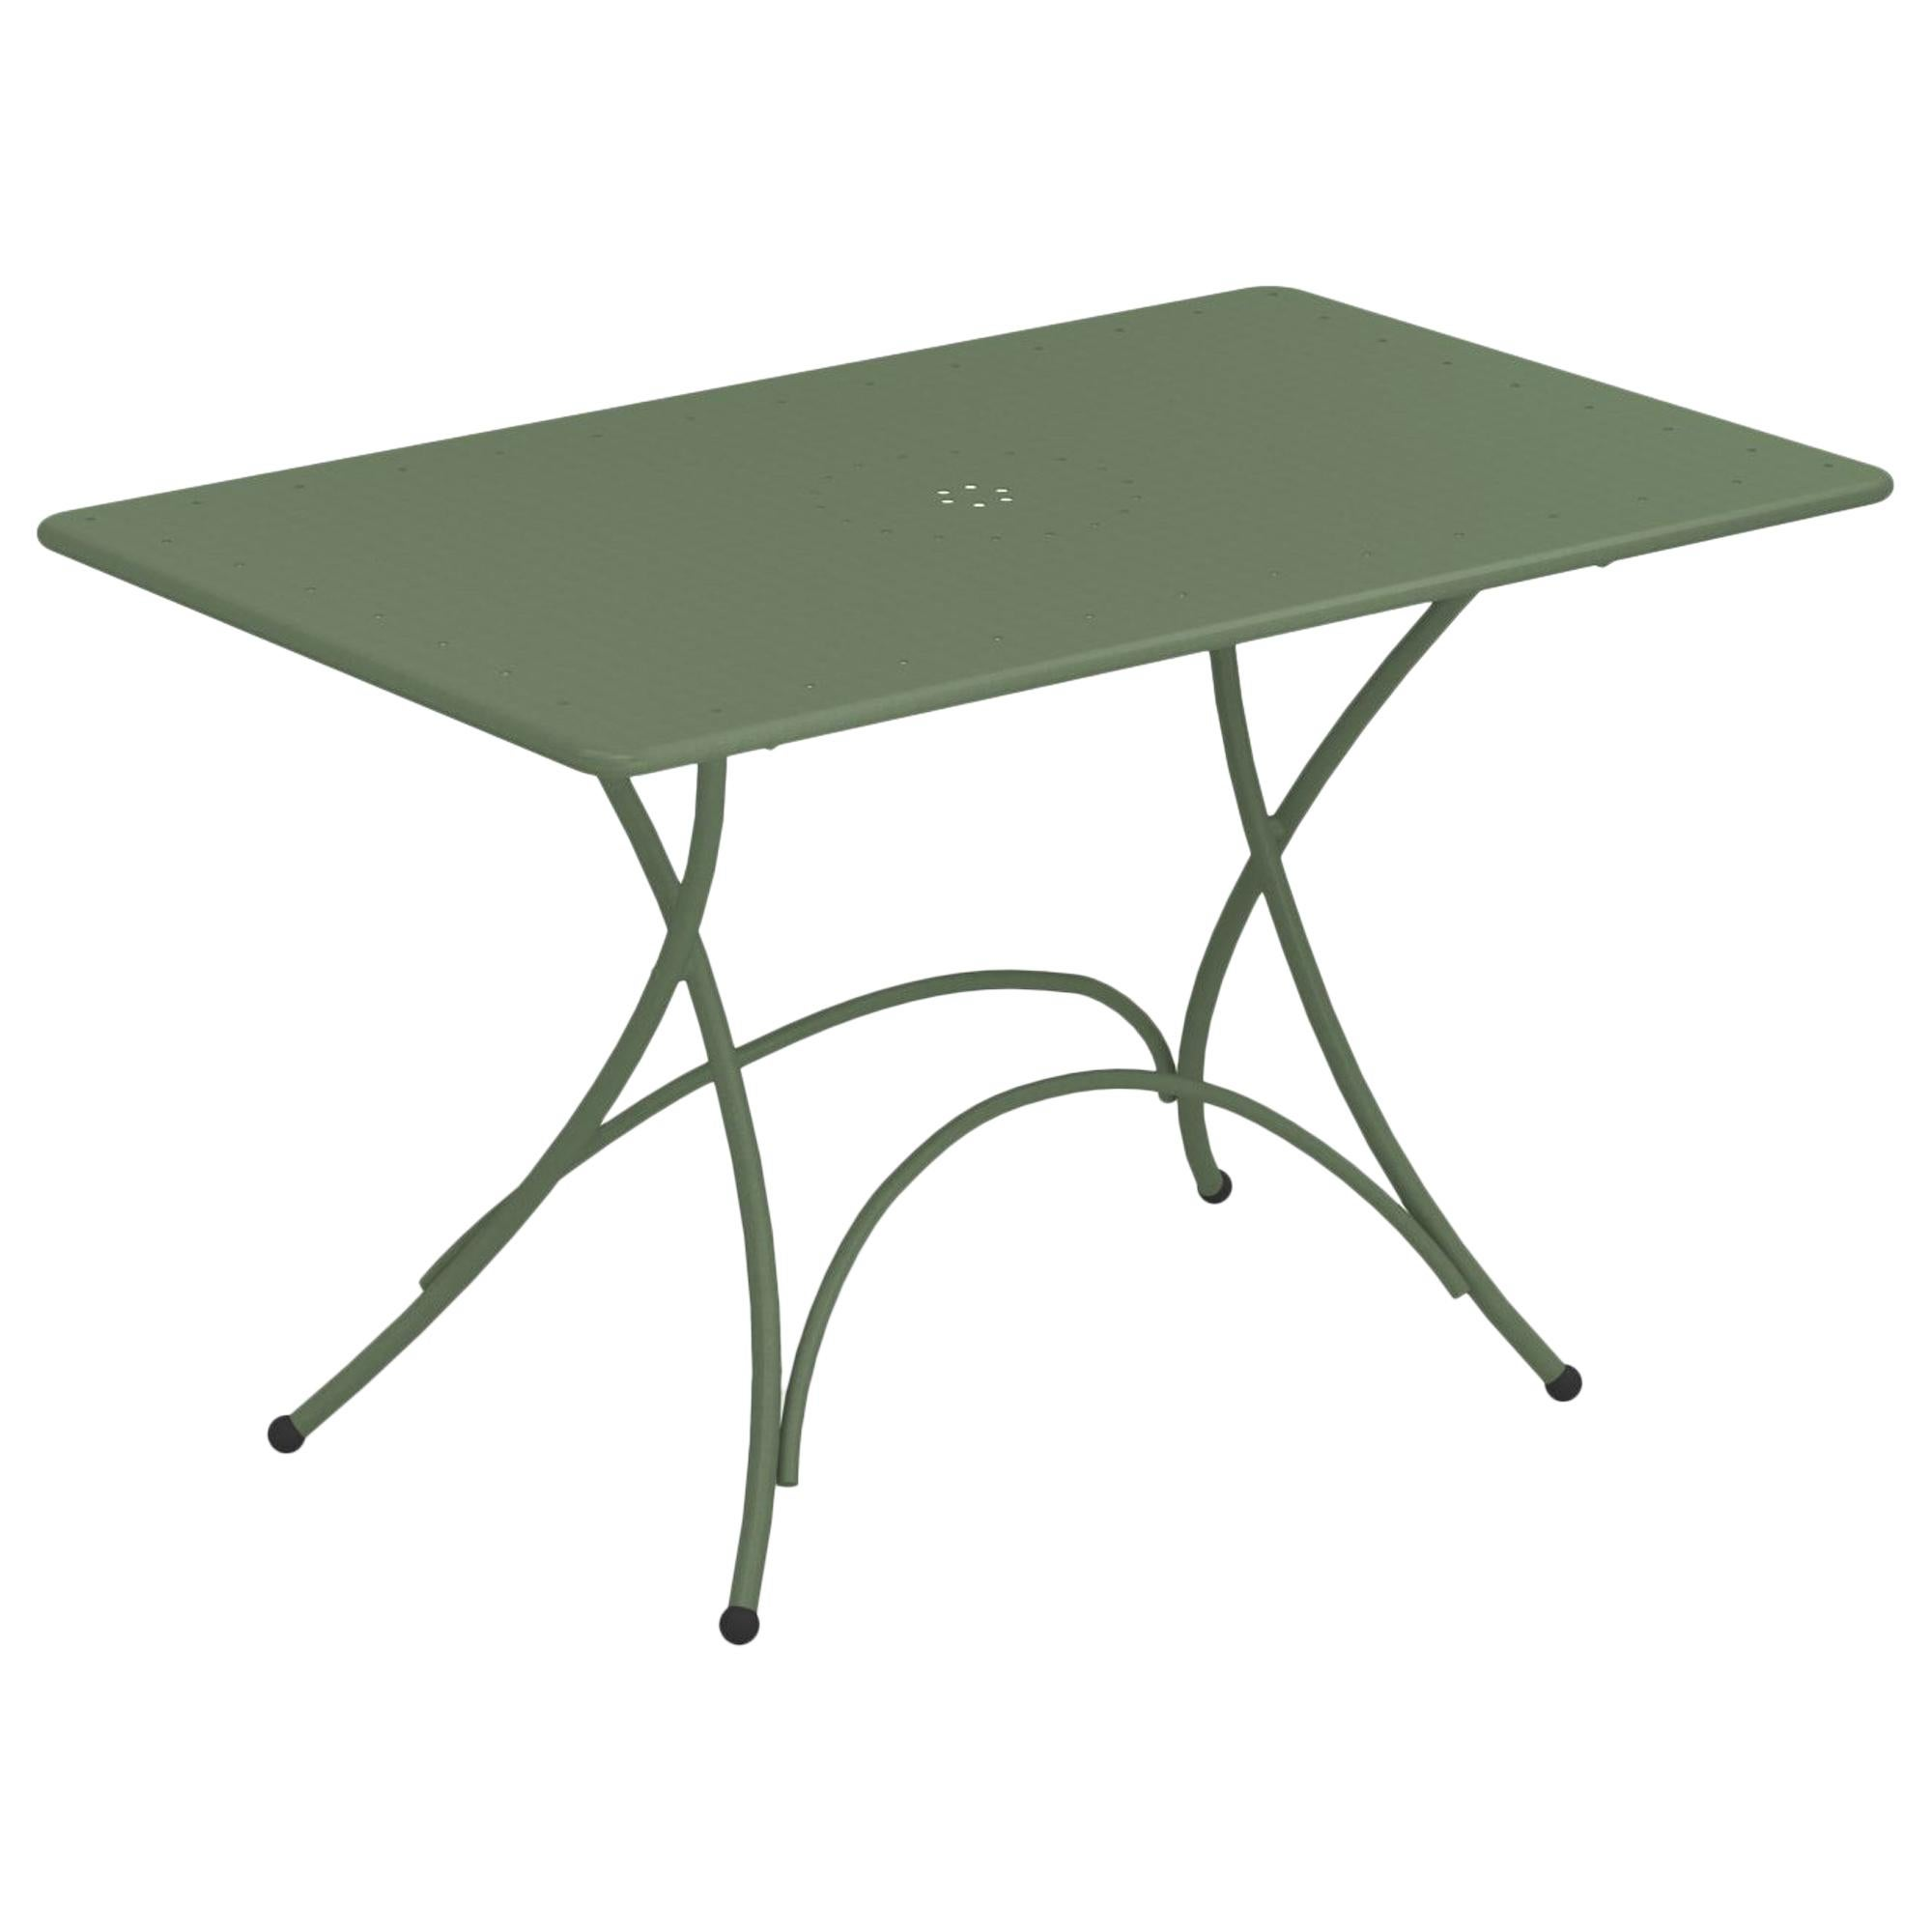 Steel EMU Pigalle 4/6 Seats Folding Rectangular Table